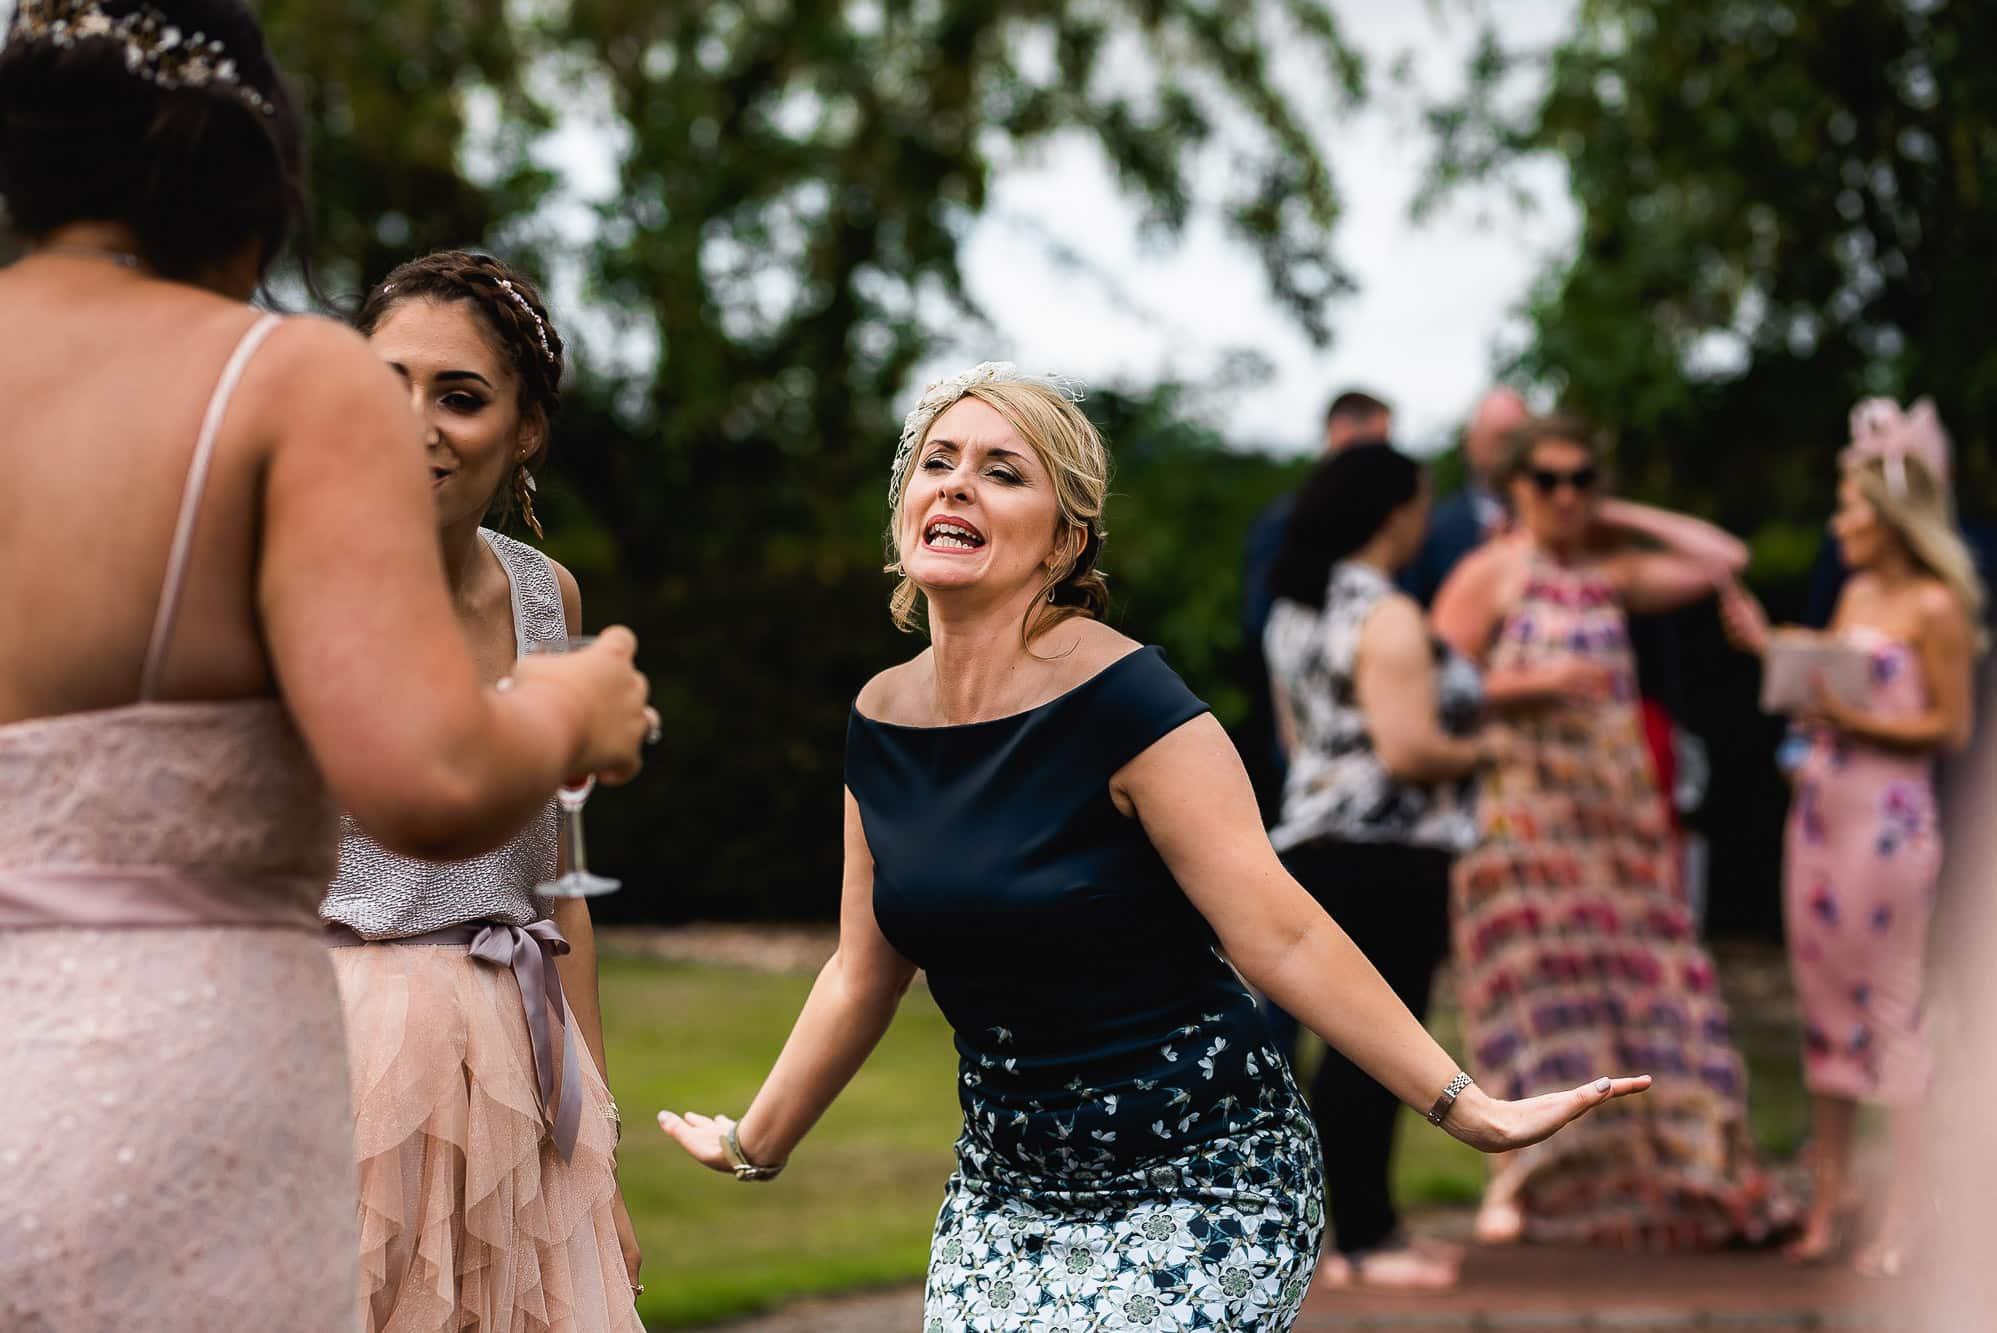 Female guest dancing